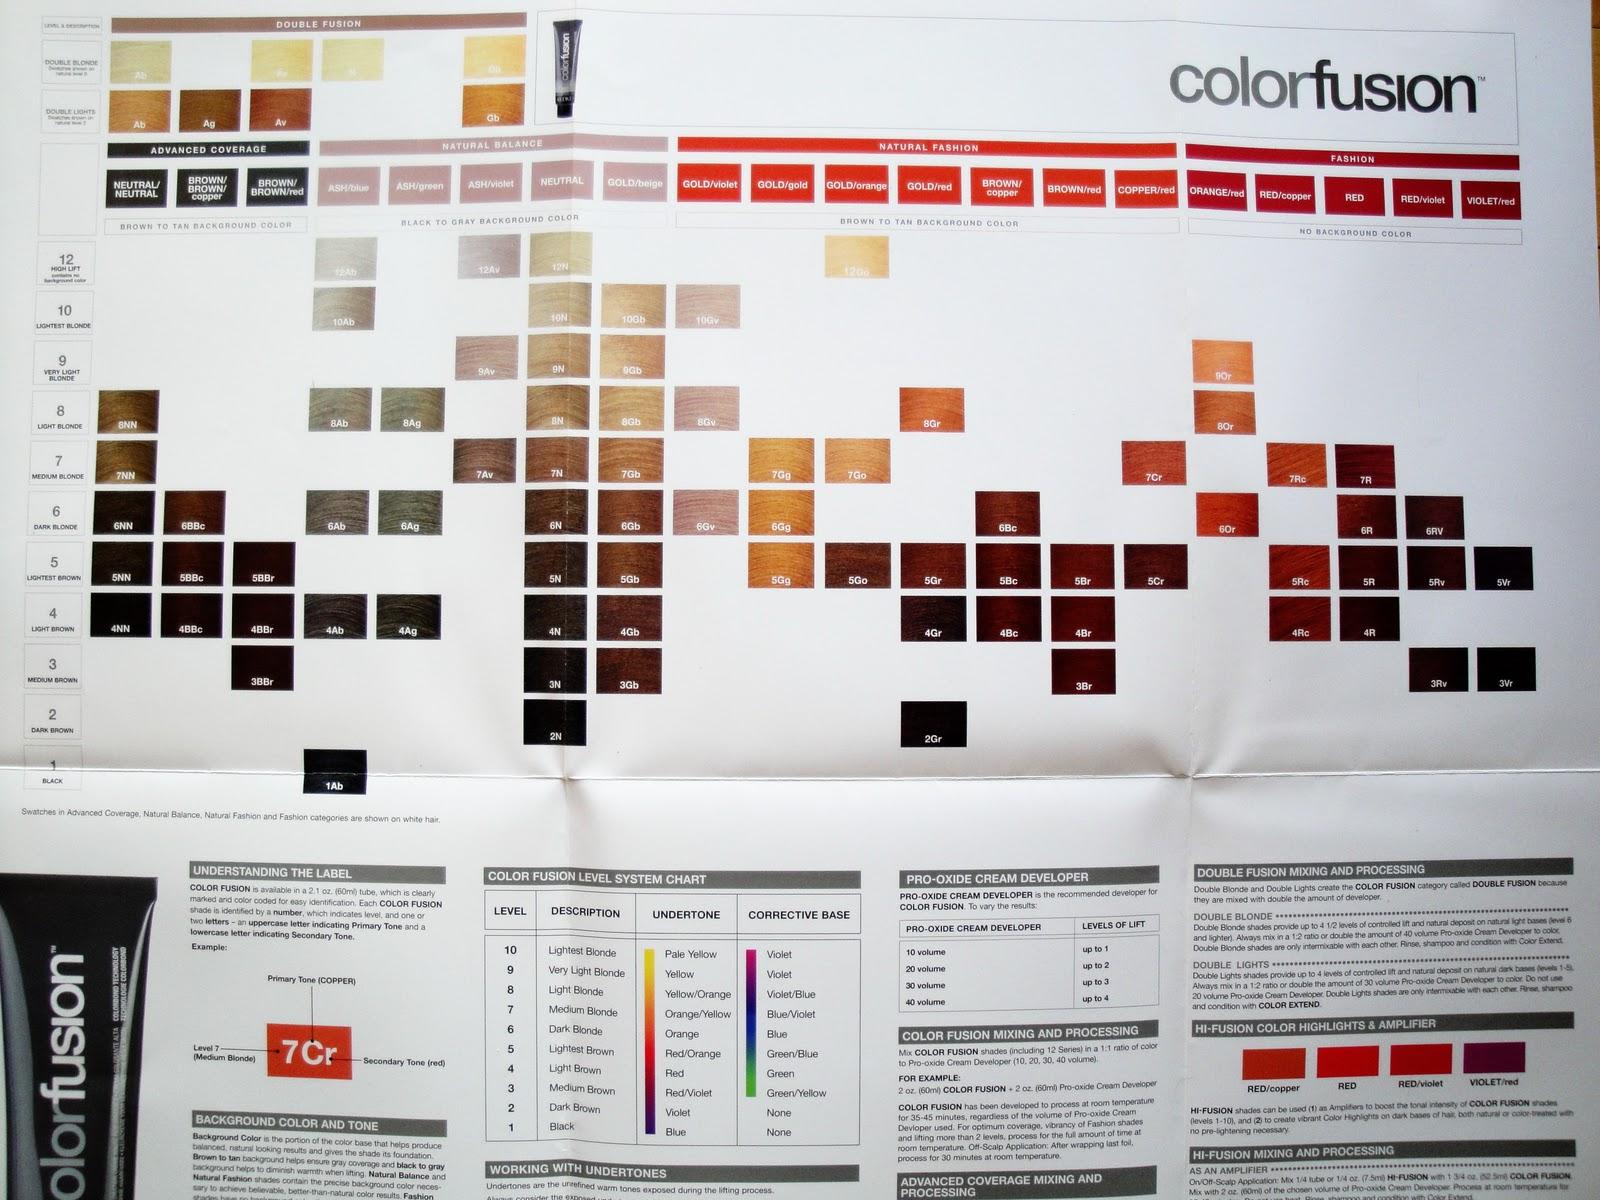 Redken Cover Fusion Color Chart Rebellions